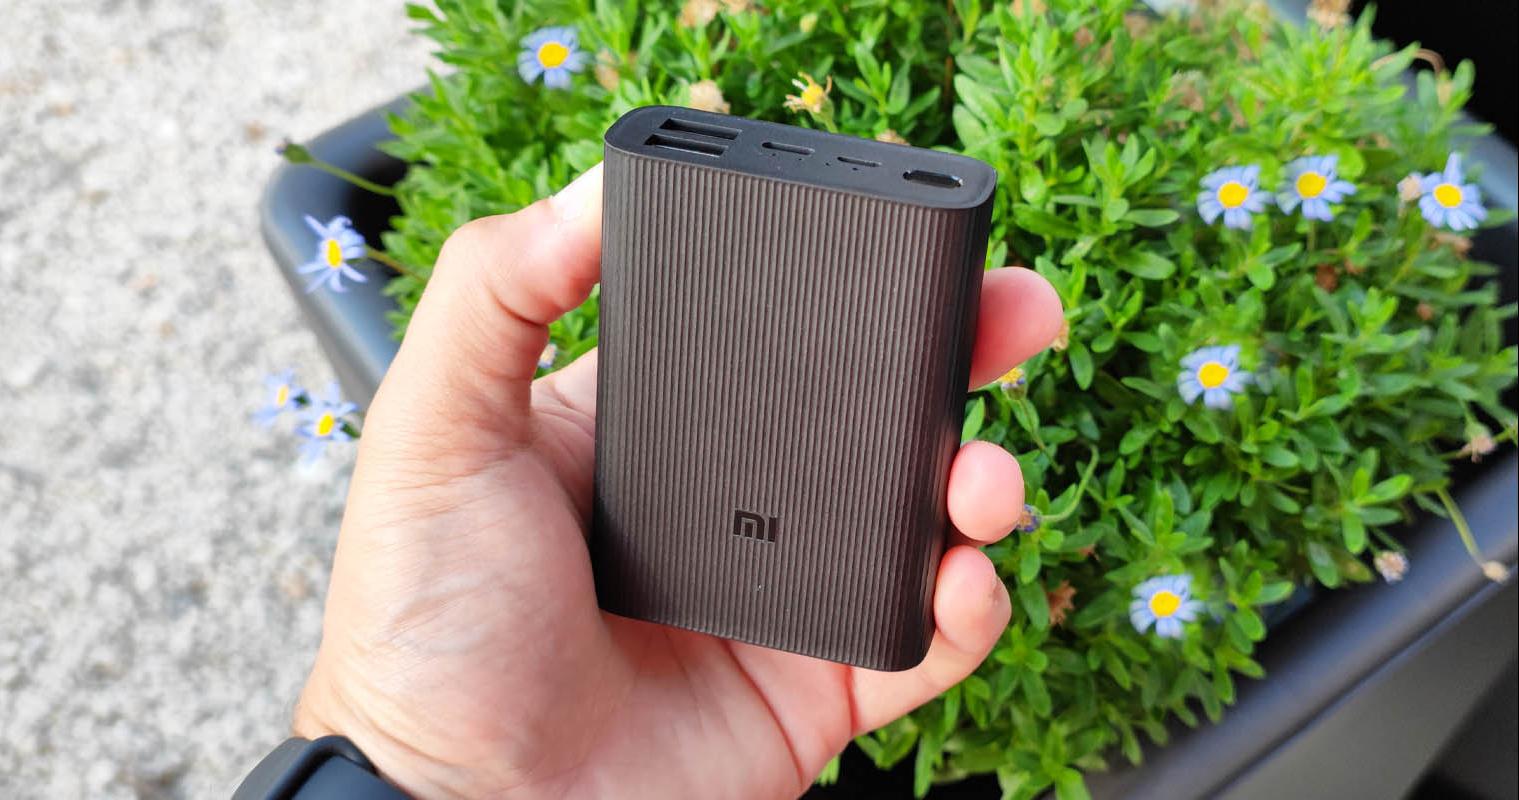 analisis-review-bateria-xiaomi-mi-power-bank-3-ultra-compact.jpg